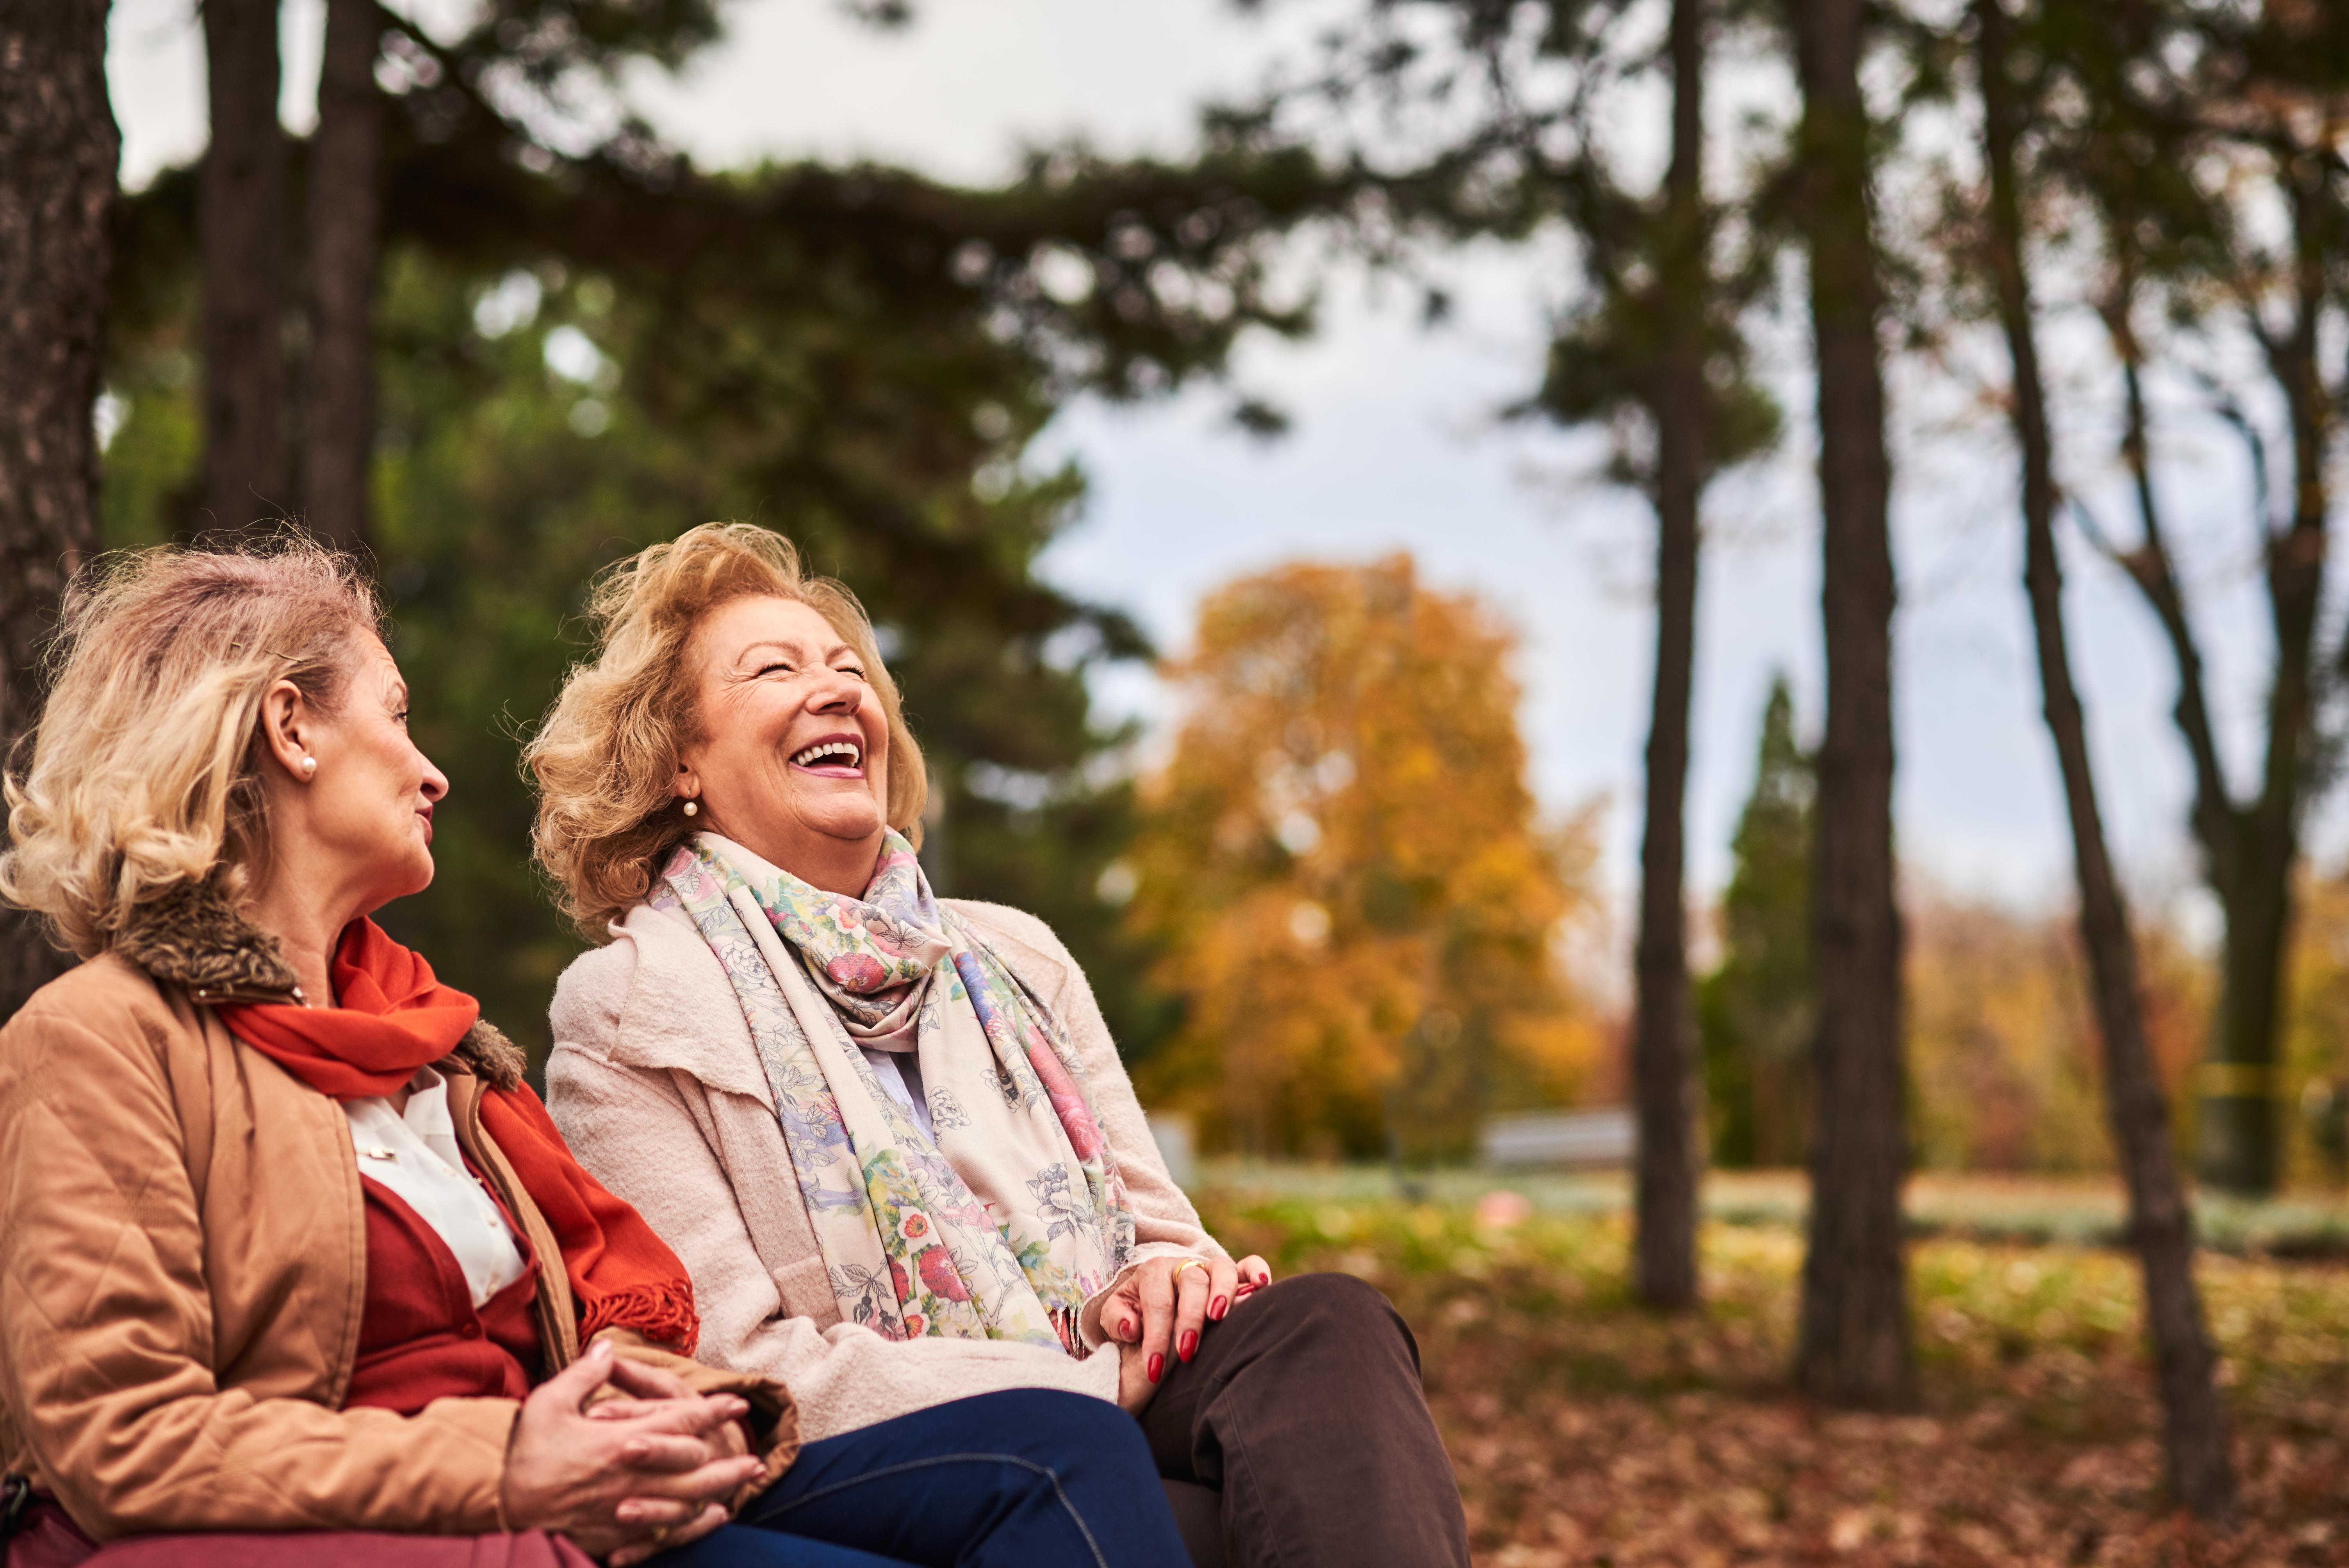 two senior women laughing in park